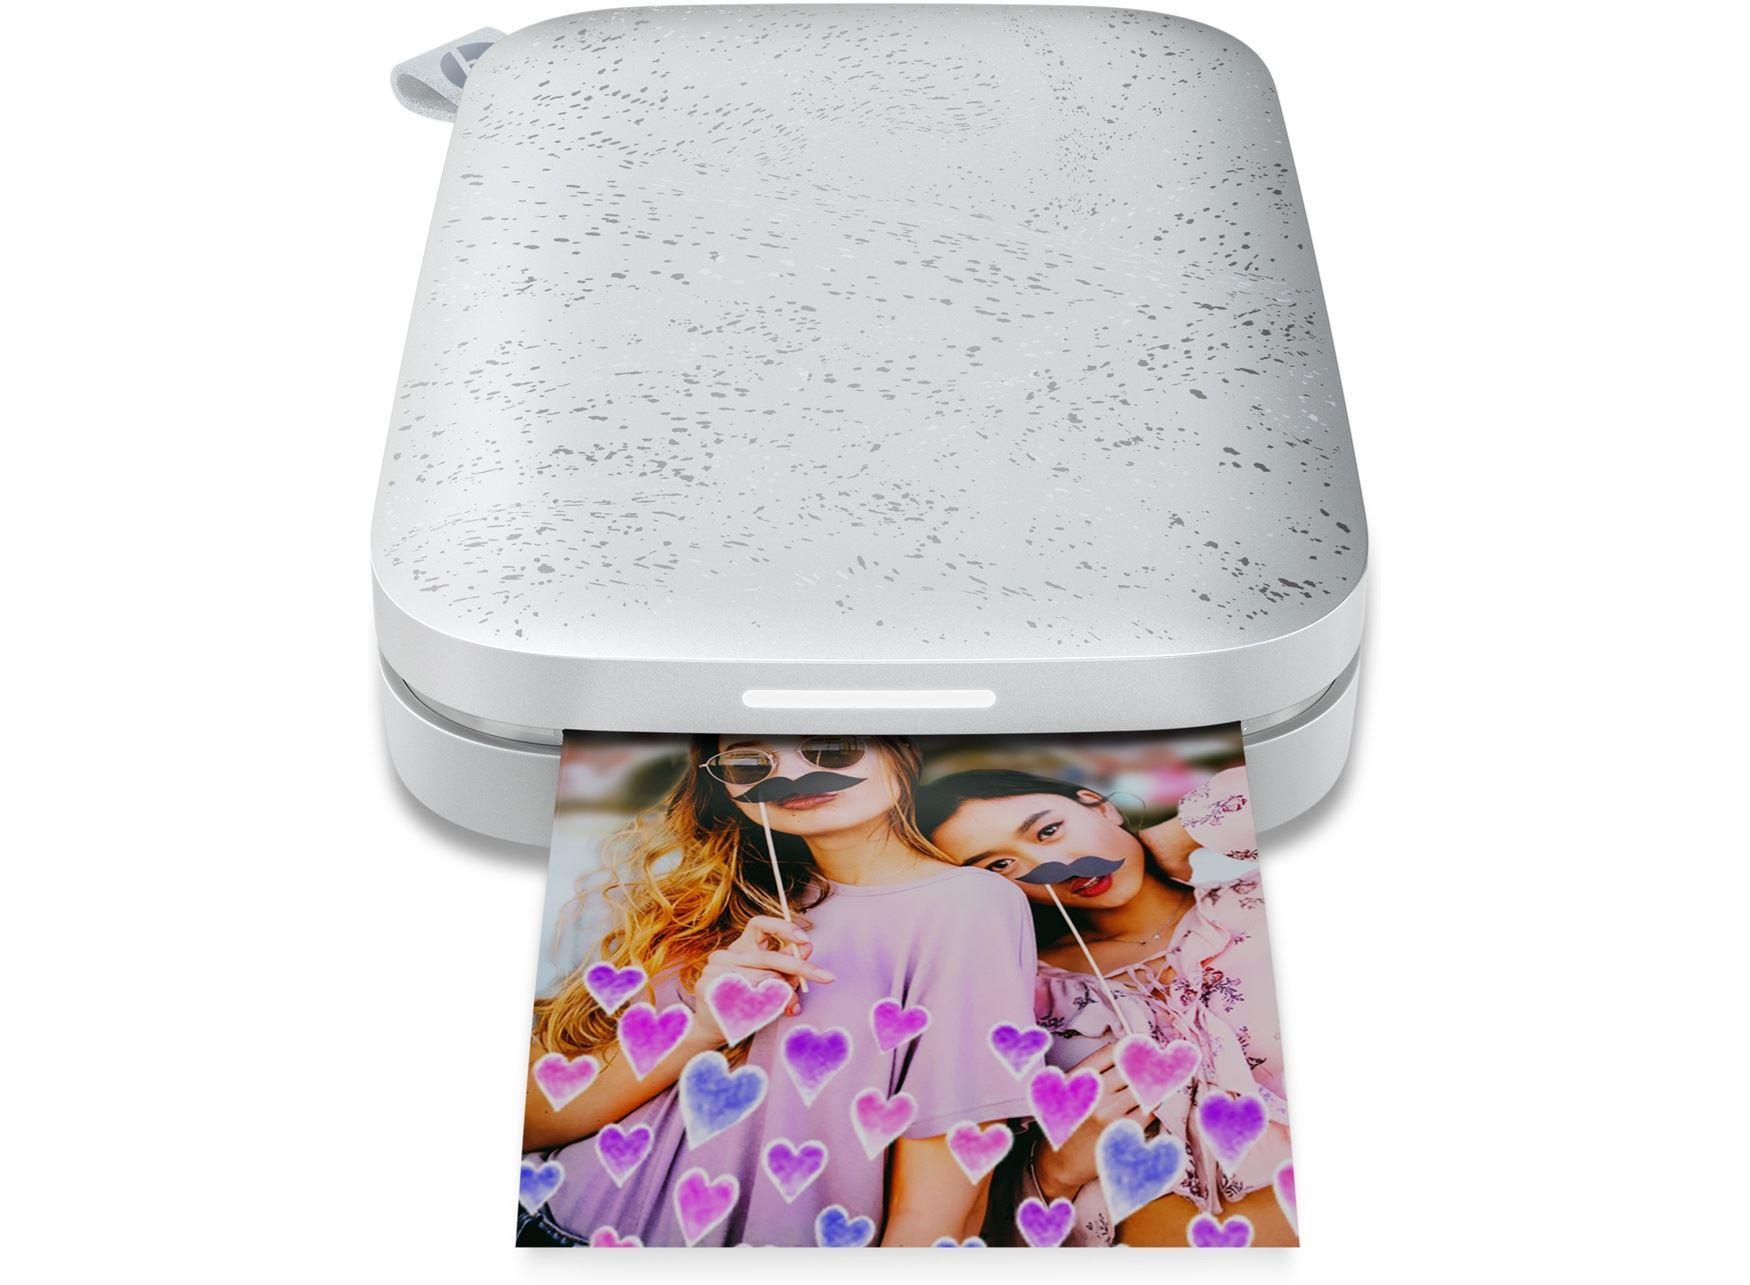 HP Sprocket Photo Printer Model 200-WHITE